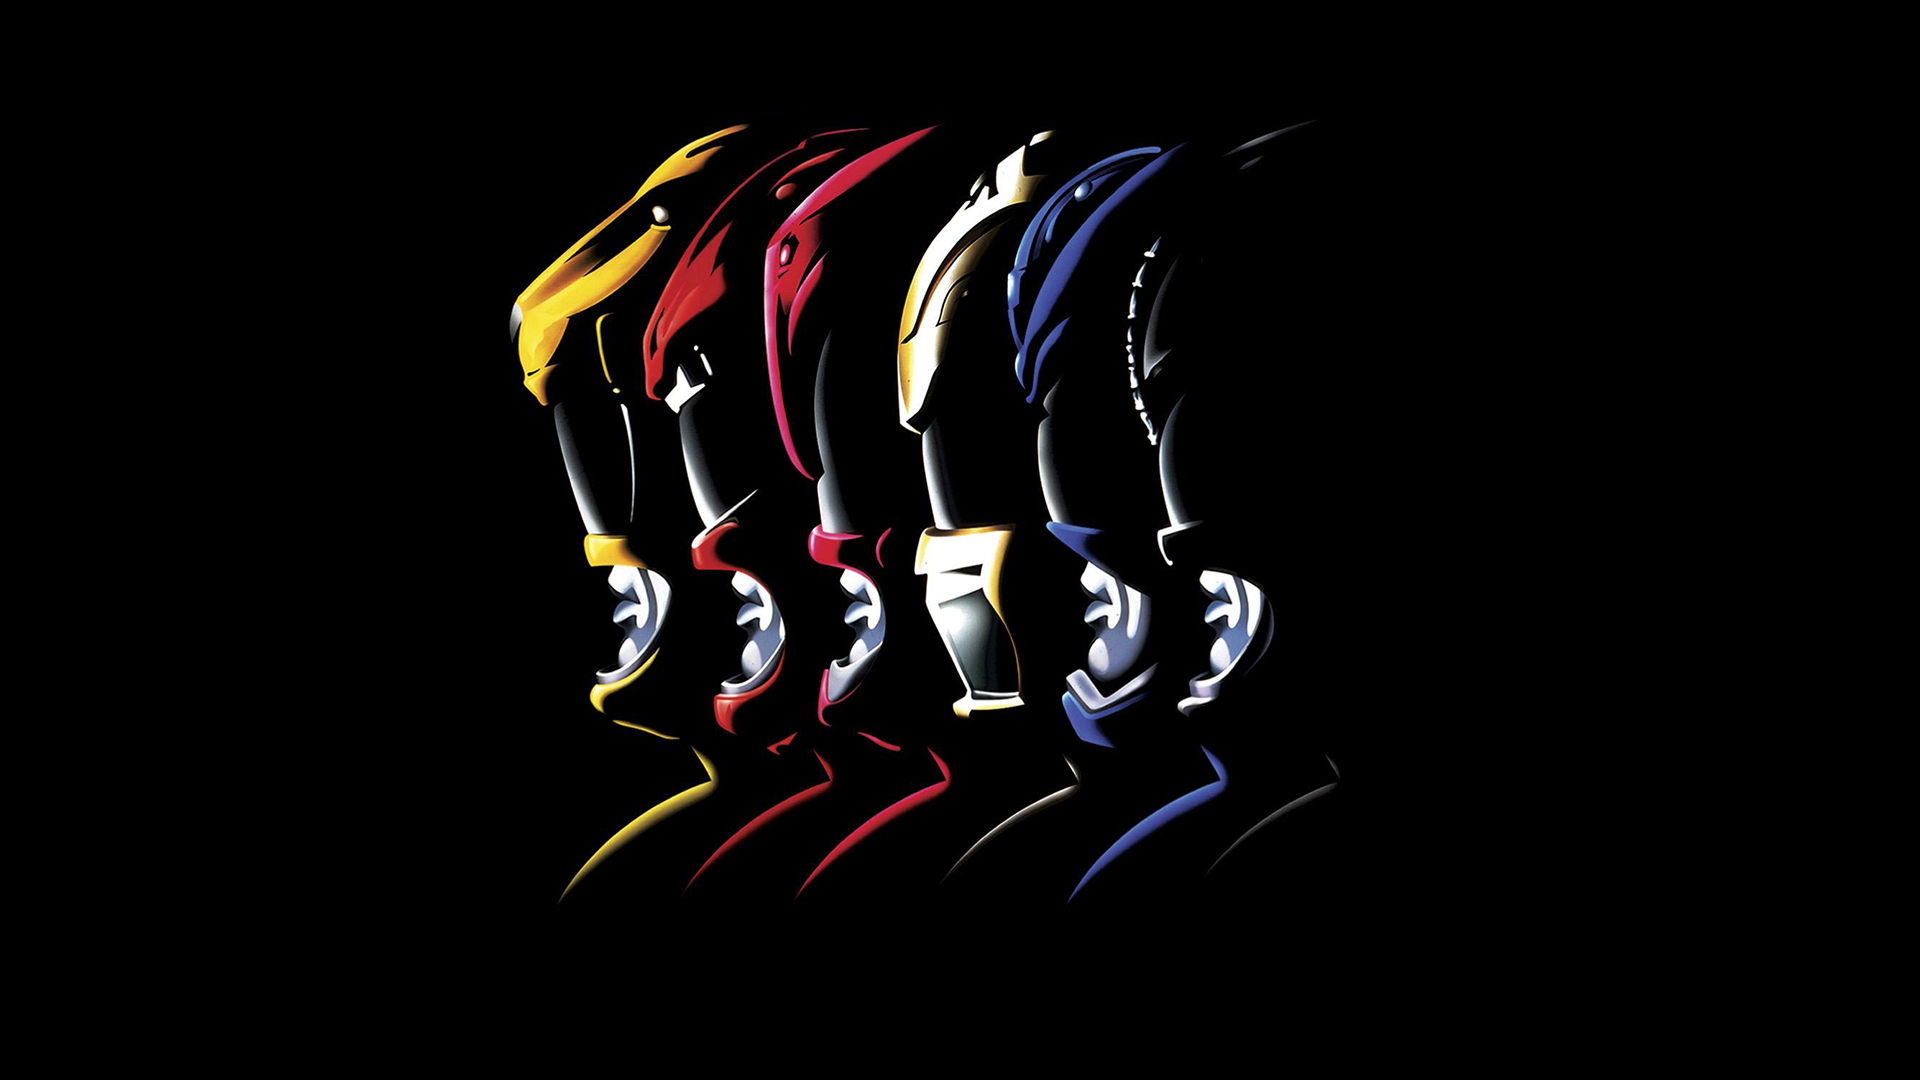 Mighty morphin power rangers wallpaper logo